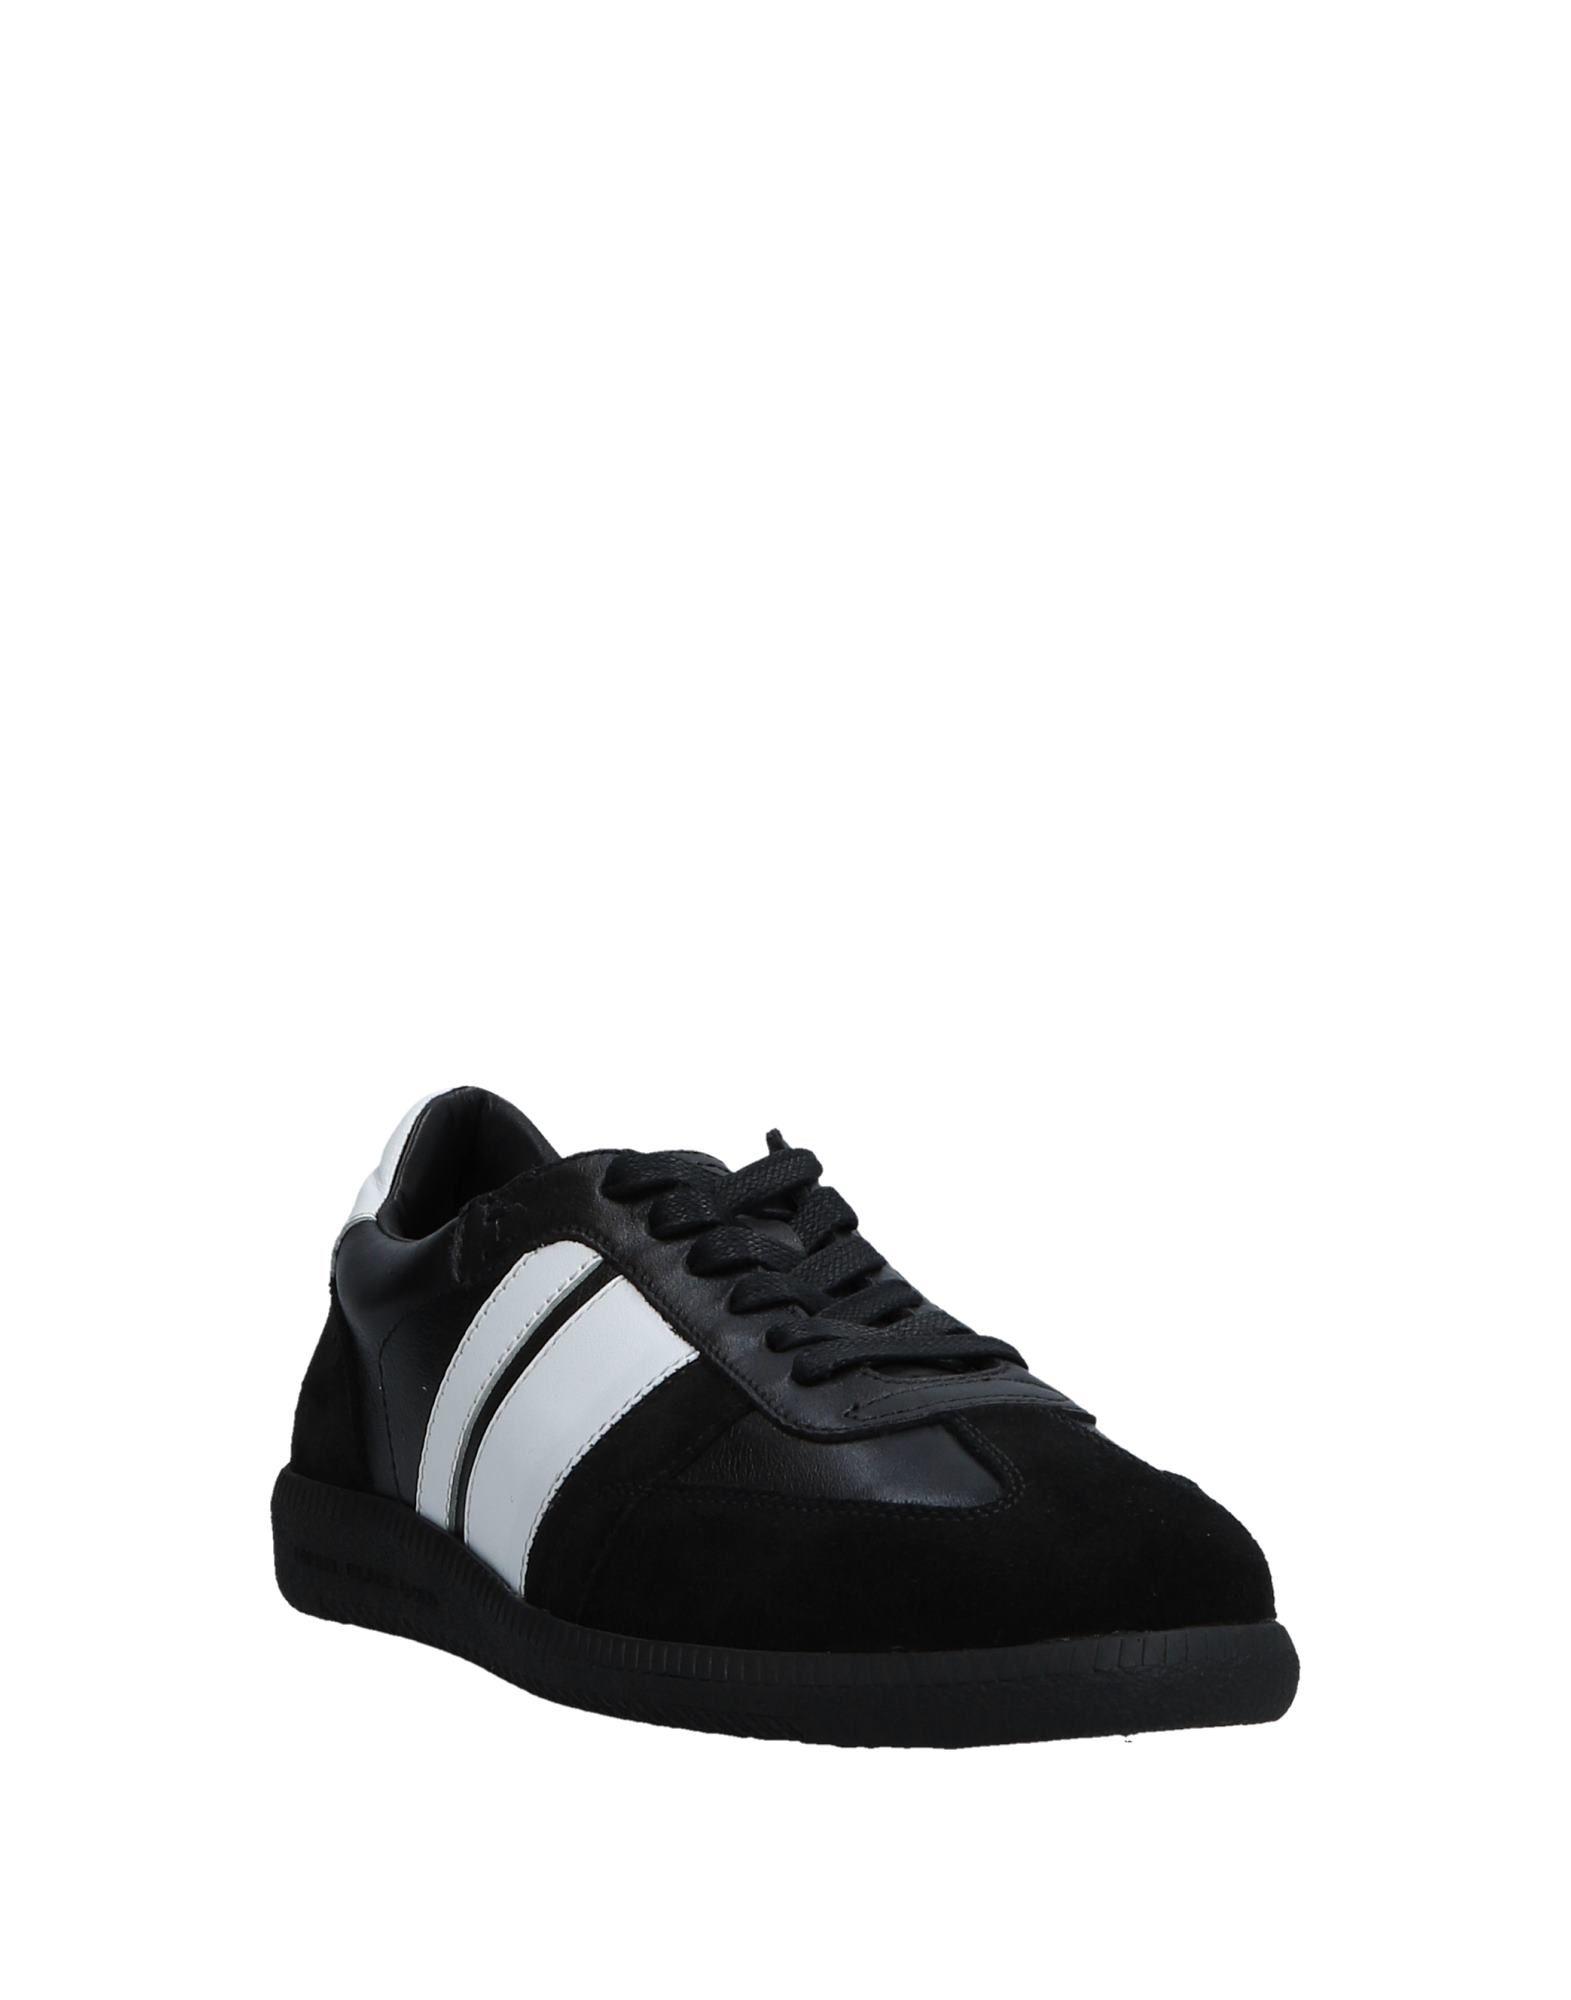 Stilvolle billige Schuhe Diesel  Black Gold Sneakers Damen  Diesel 11532193BK 0ccbc4